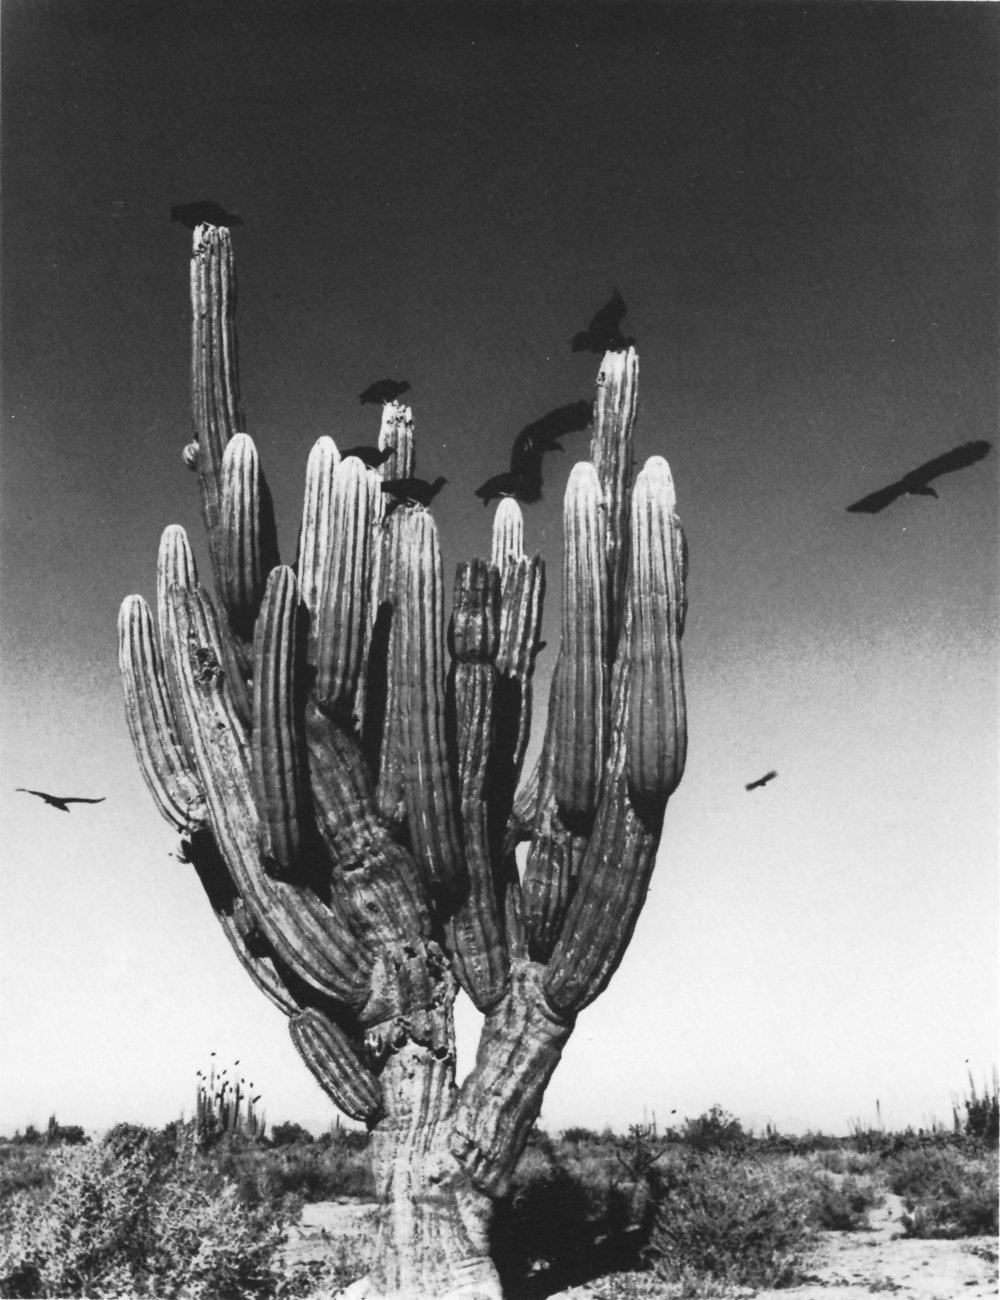 Graciela Iturbide    Sahuaro , Desierto de Sonora, Mexico, 1979  20 x 16 inch Silver Gelatin Print